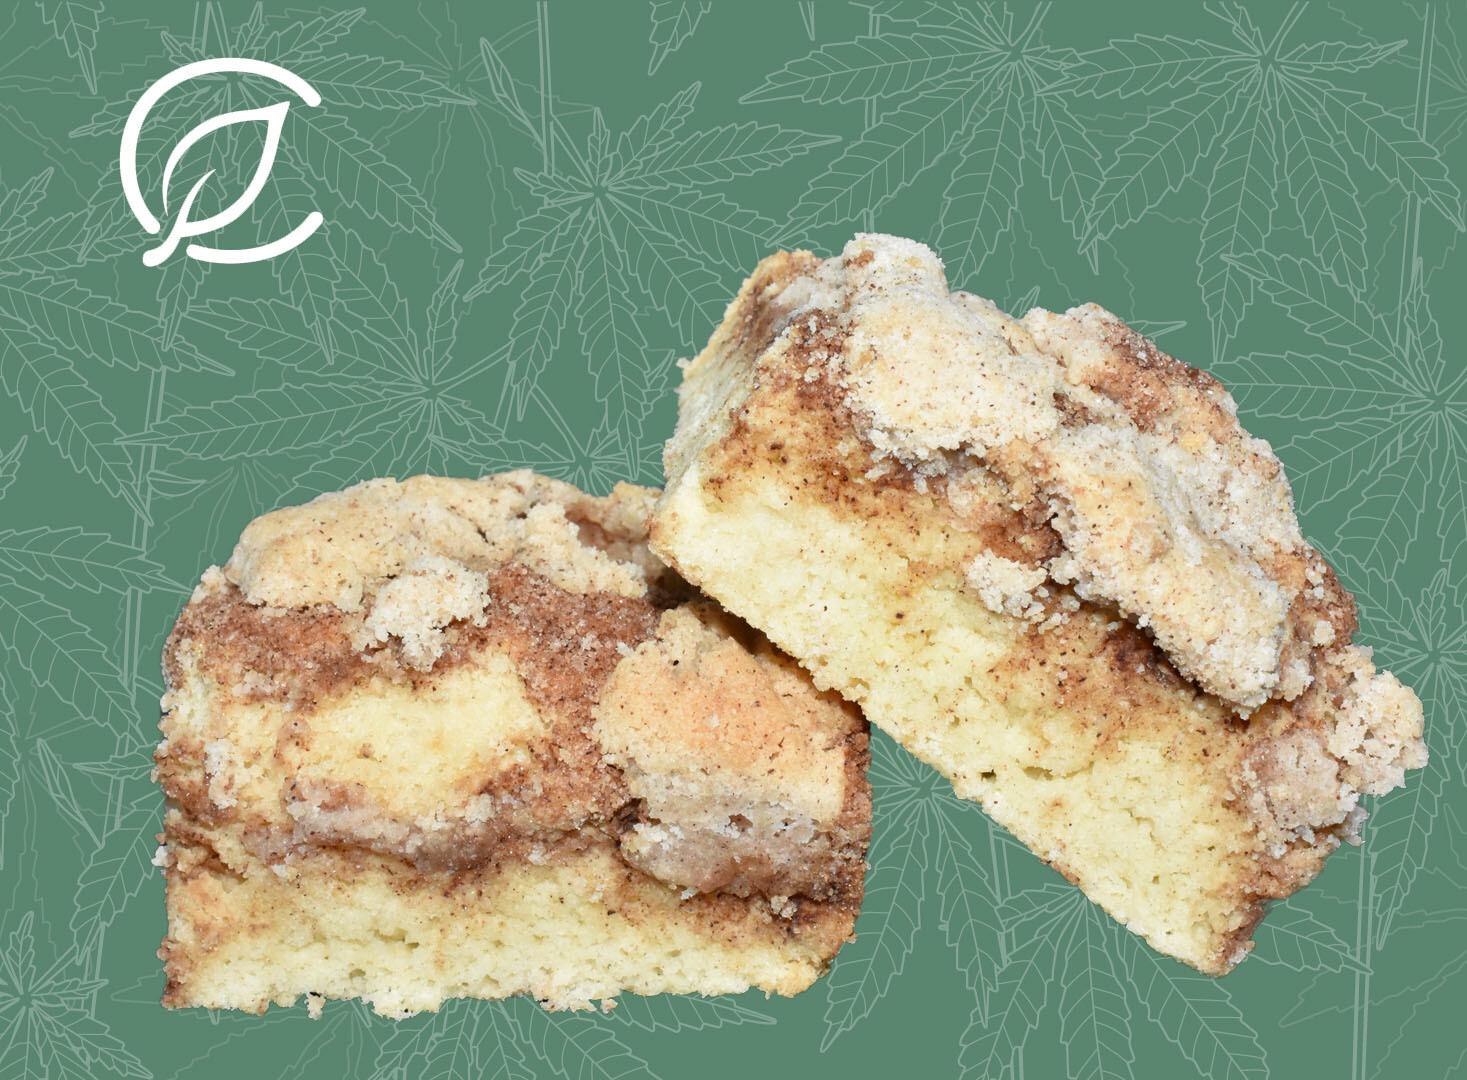 Coffee Cake Bars 8584 (46.48 mg Hybrid THC x 2 Bars)(CL)